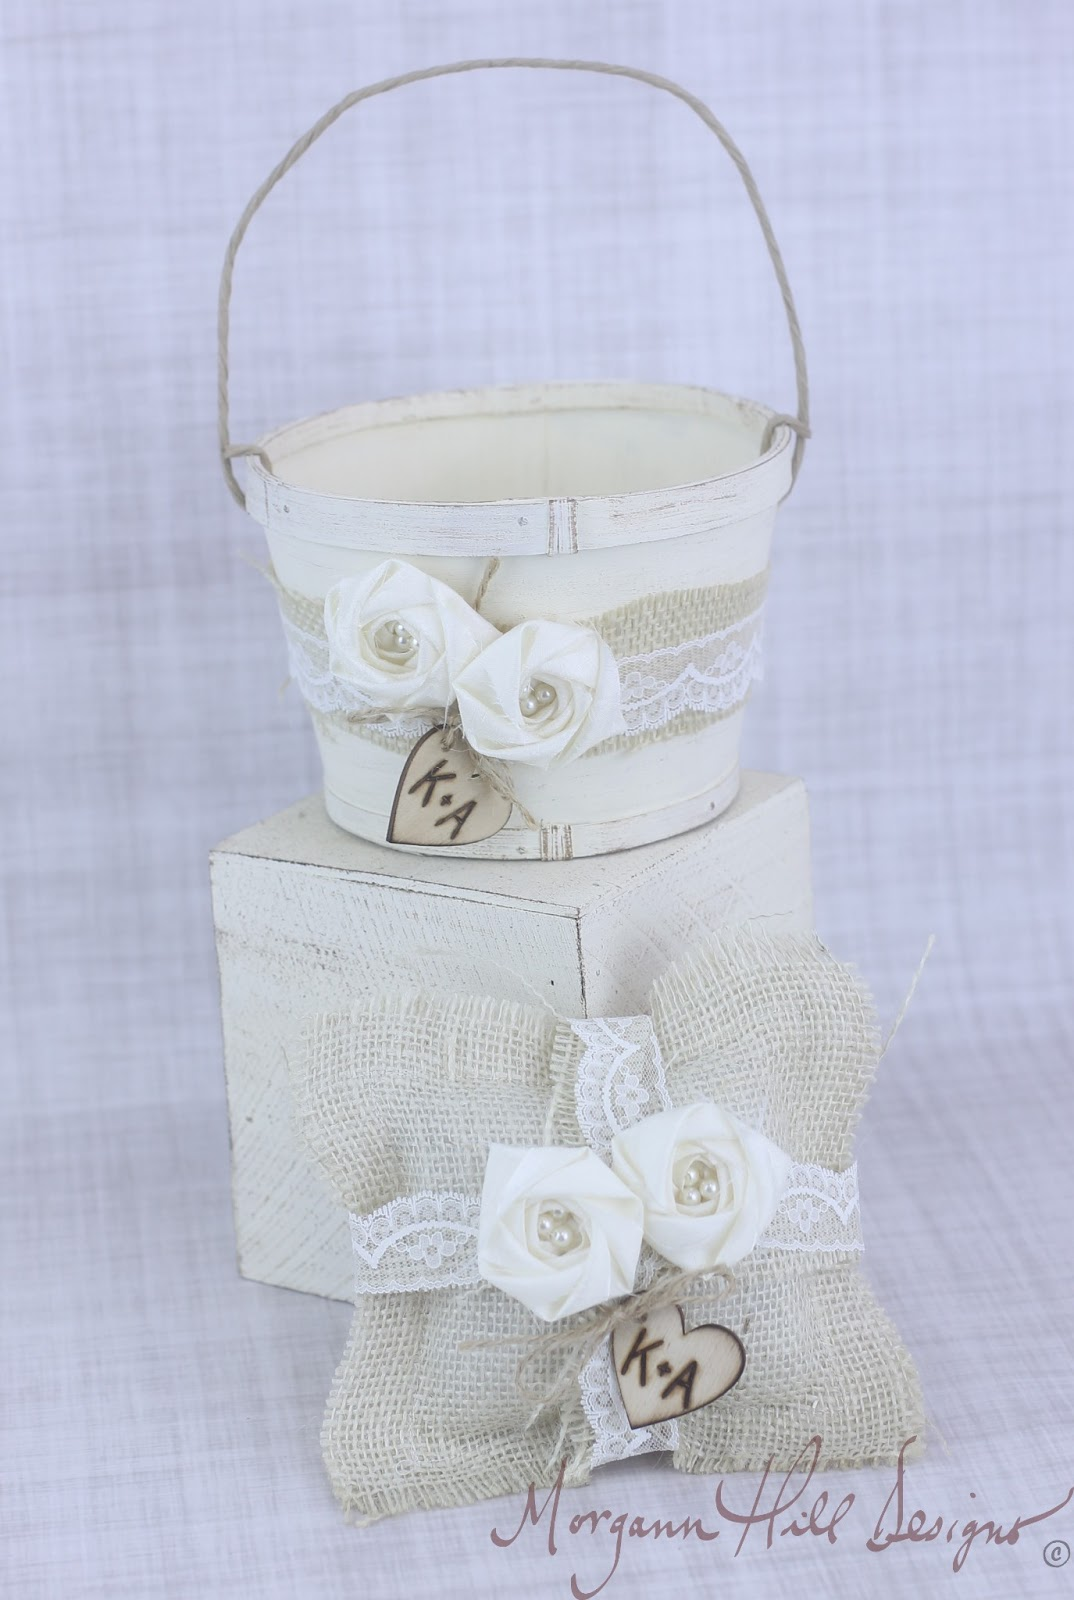 Cheap flower girl baskets and ring bearer pillows all print image cheap flower girl baskets and ring bearer pillows izmirmasajfo